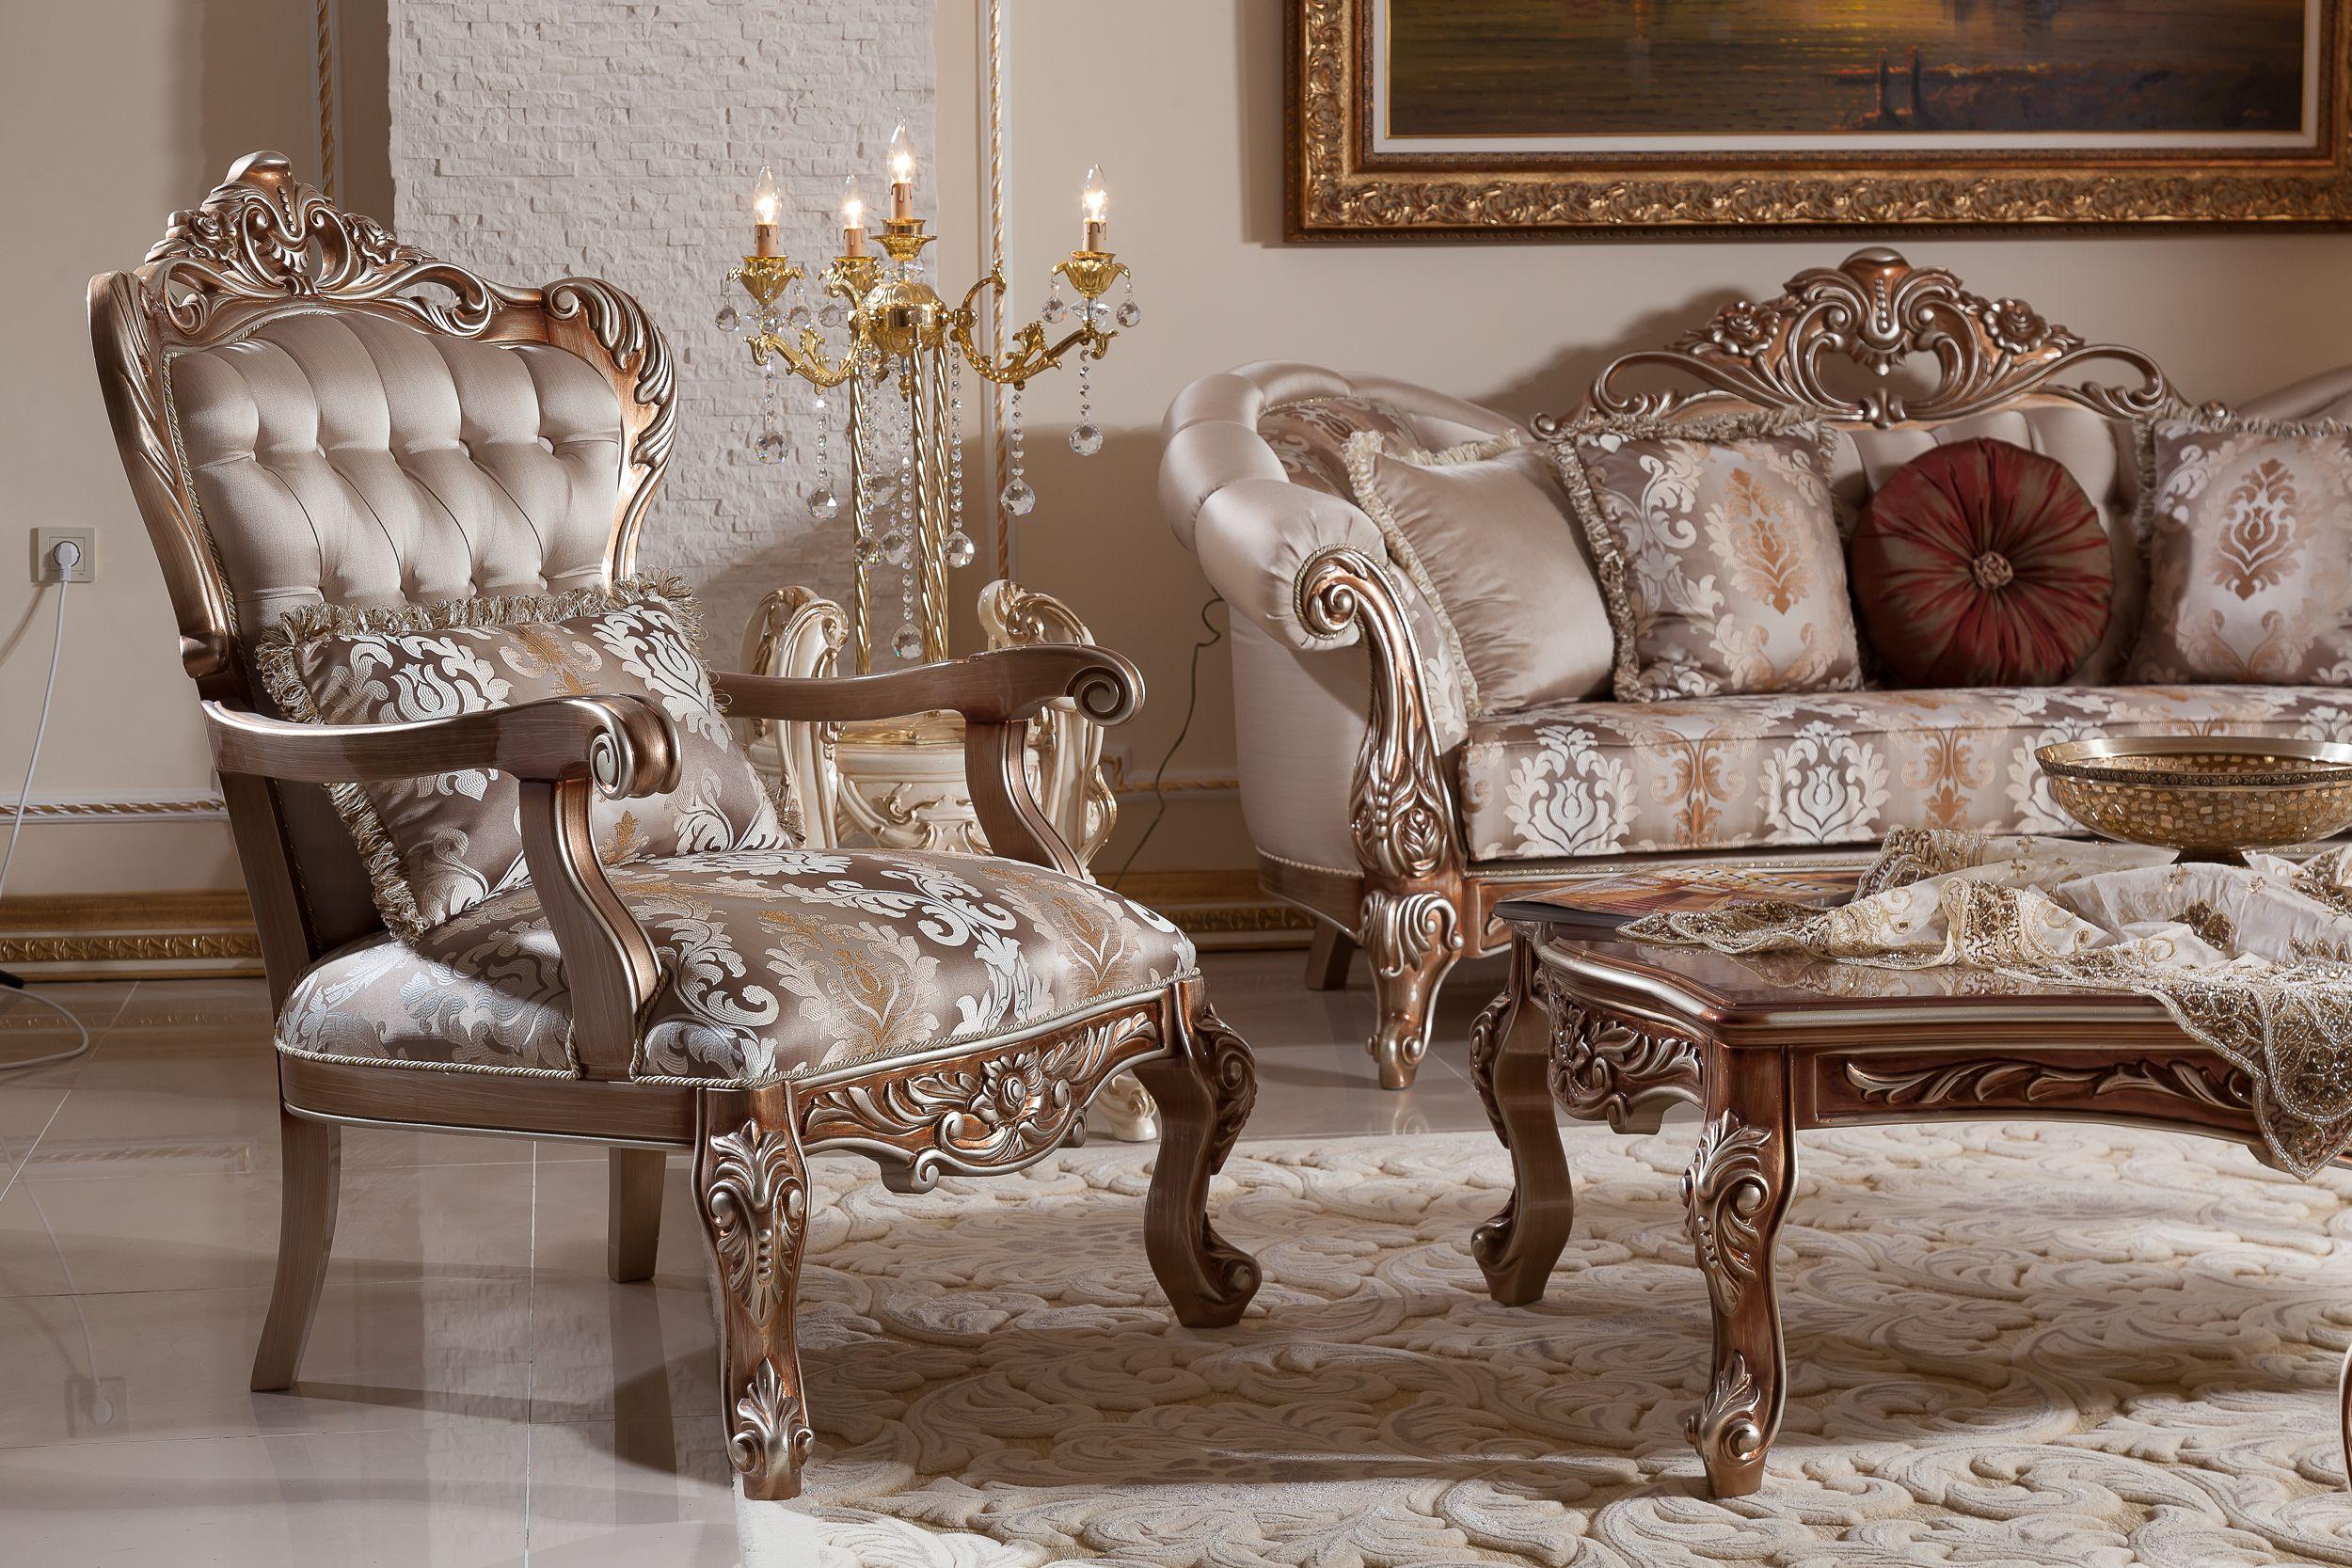 Tugra Sofa Set Handmade Turkish Furniture You Can Give Order This Sofa Set 3 3 1 1 Coffee Tab Classic Sofa Living Room Usa Furniture Luxury Furniture Design #turkish #living #room #furniture